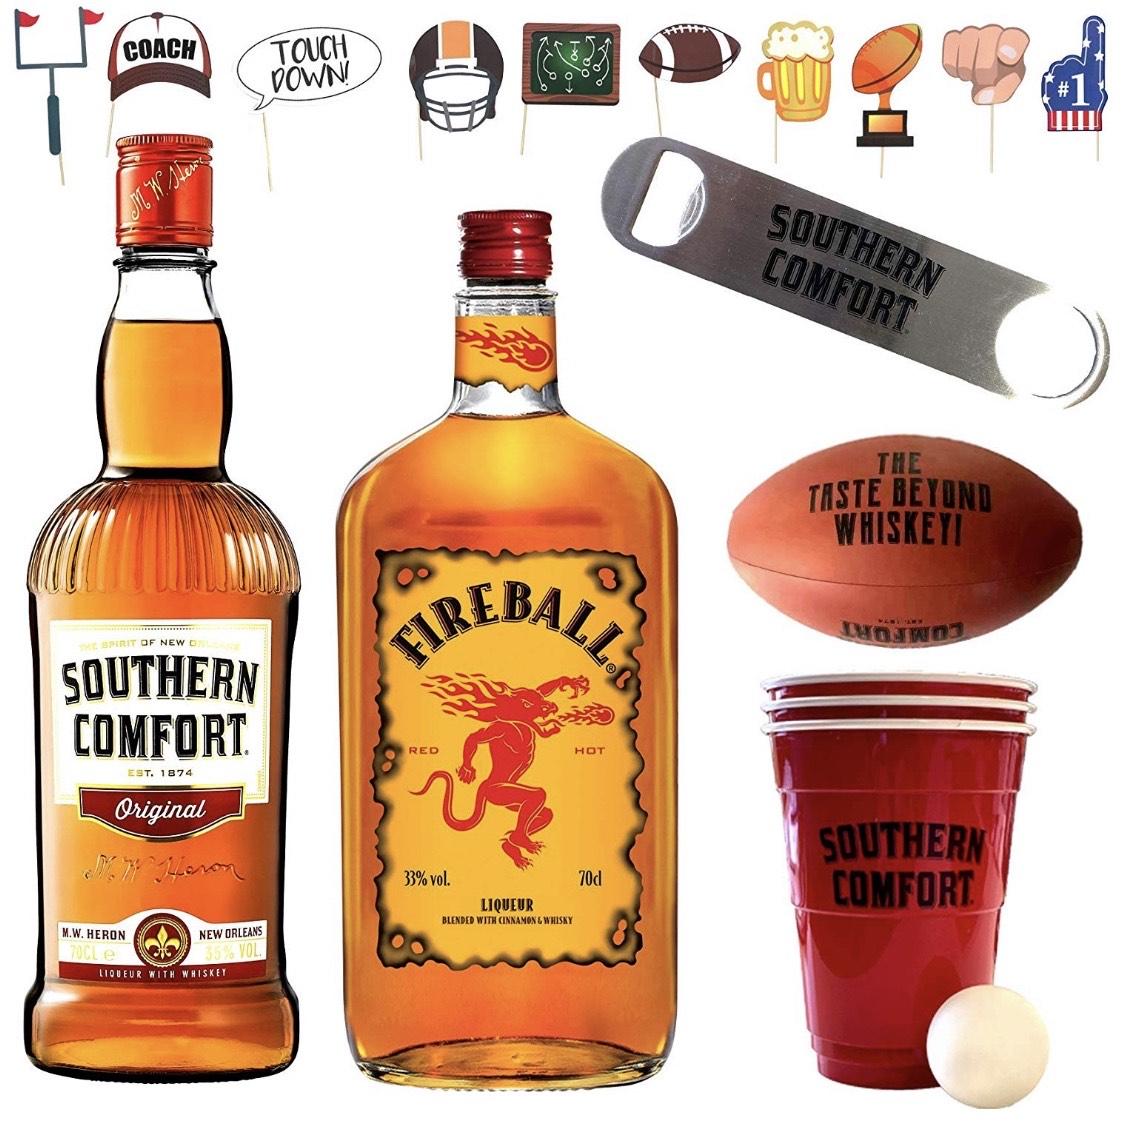 Super Bowl | Southern Comfort & Fireball Party Paket